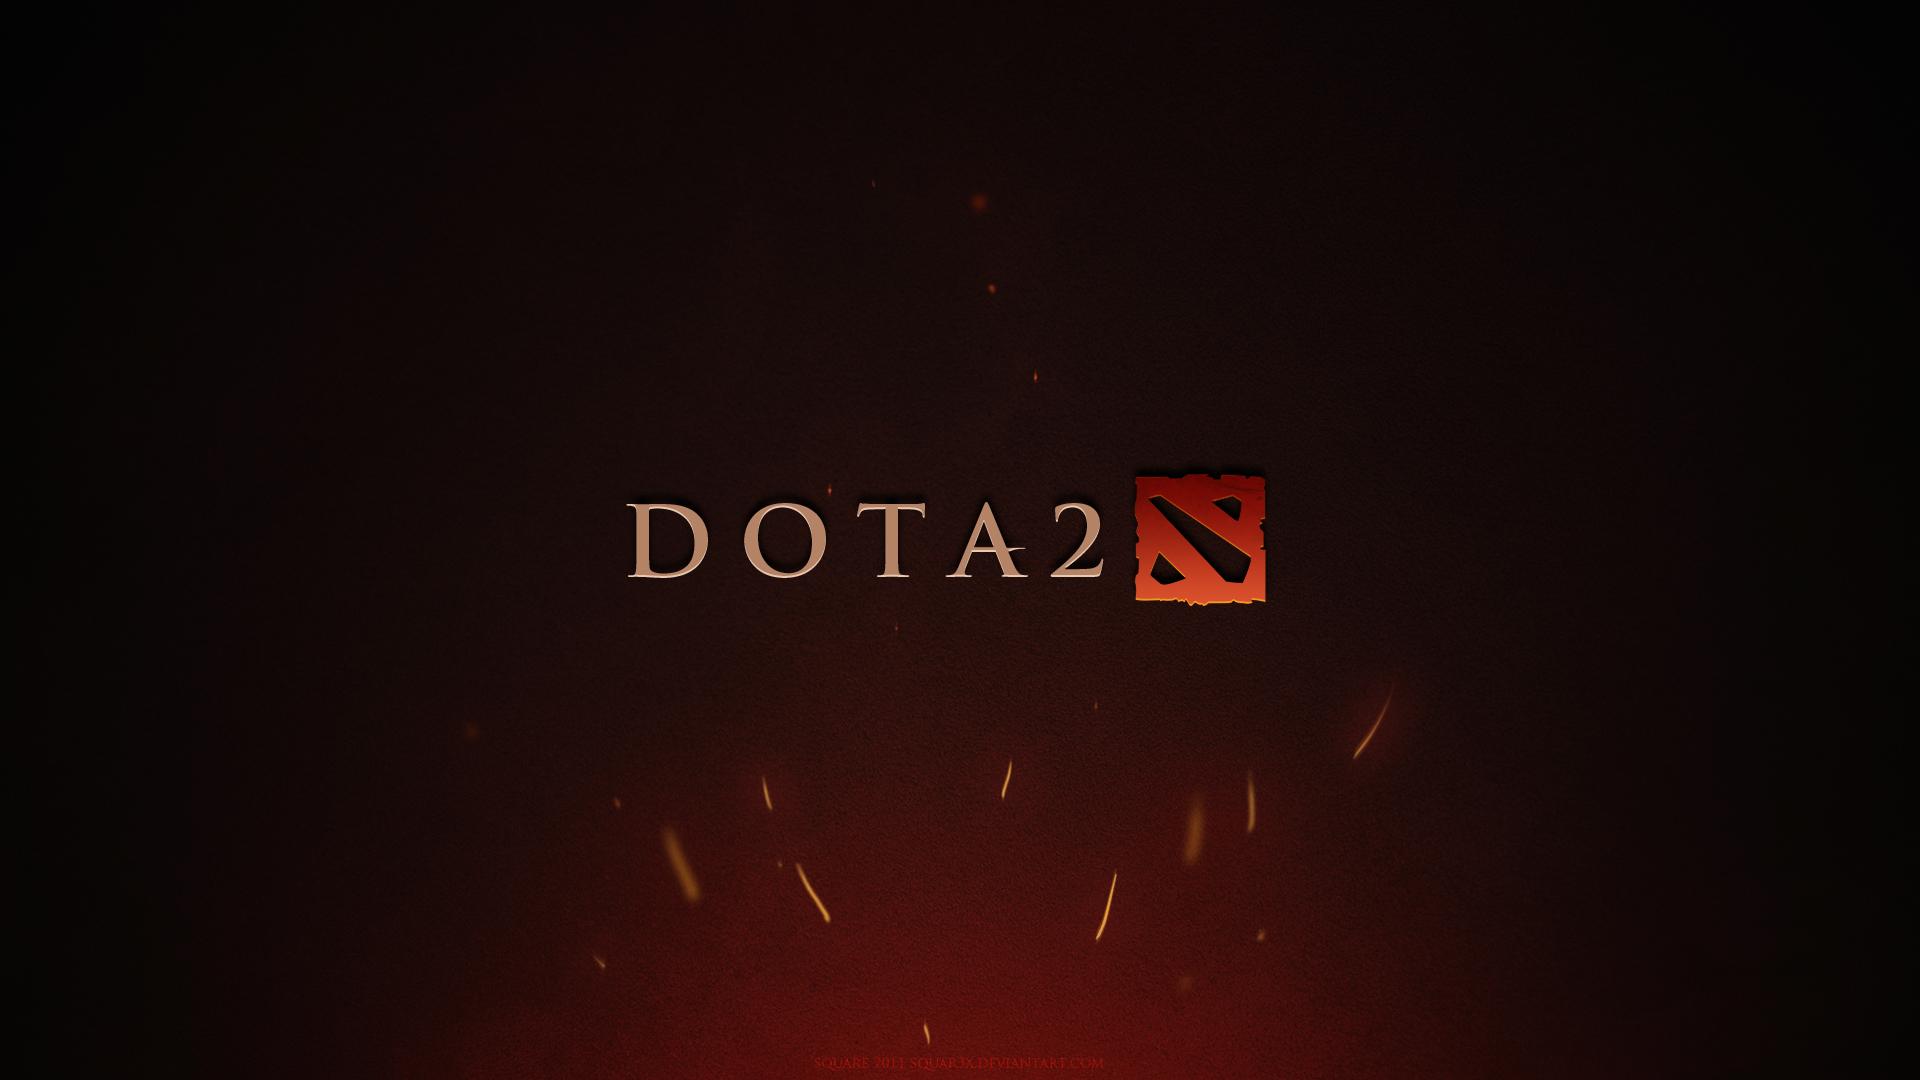 dota 2 game background - photo #47